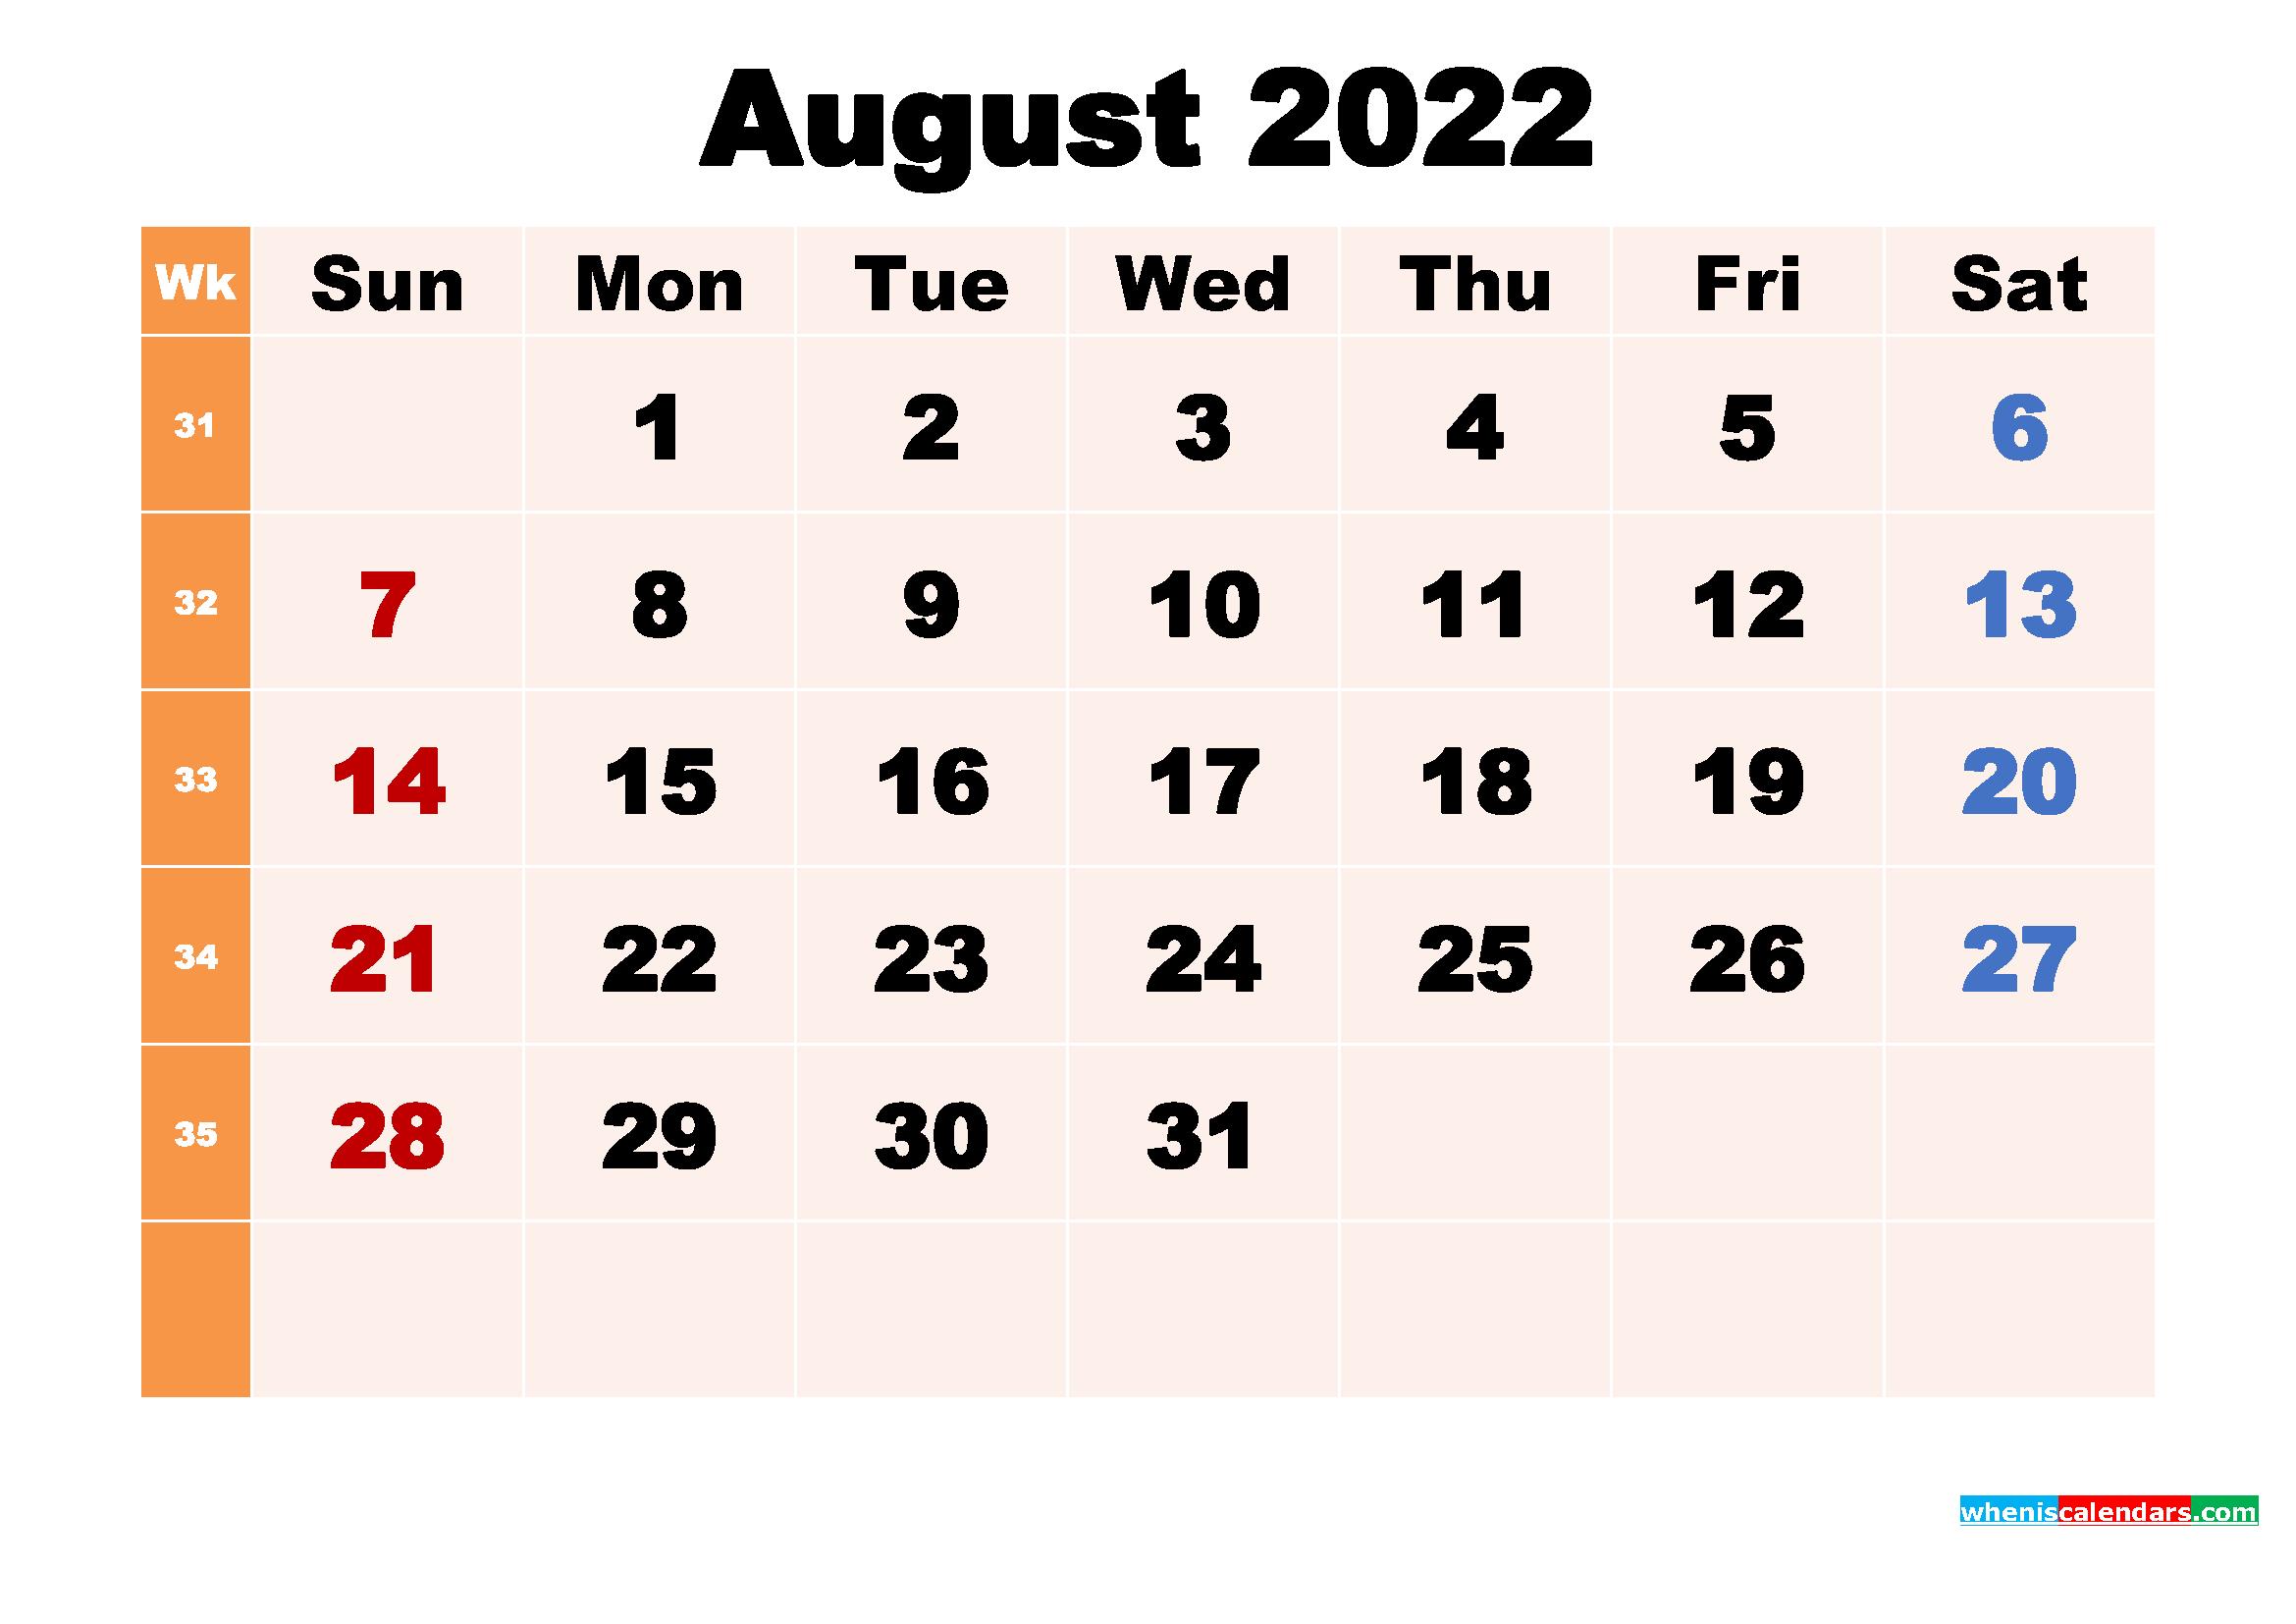 August 2022 Desktop Calendar with Holidays